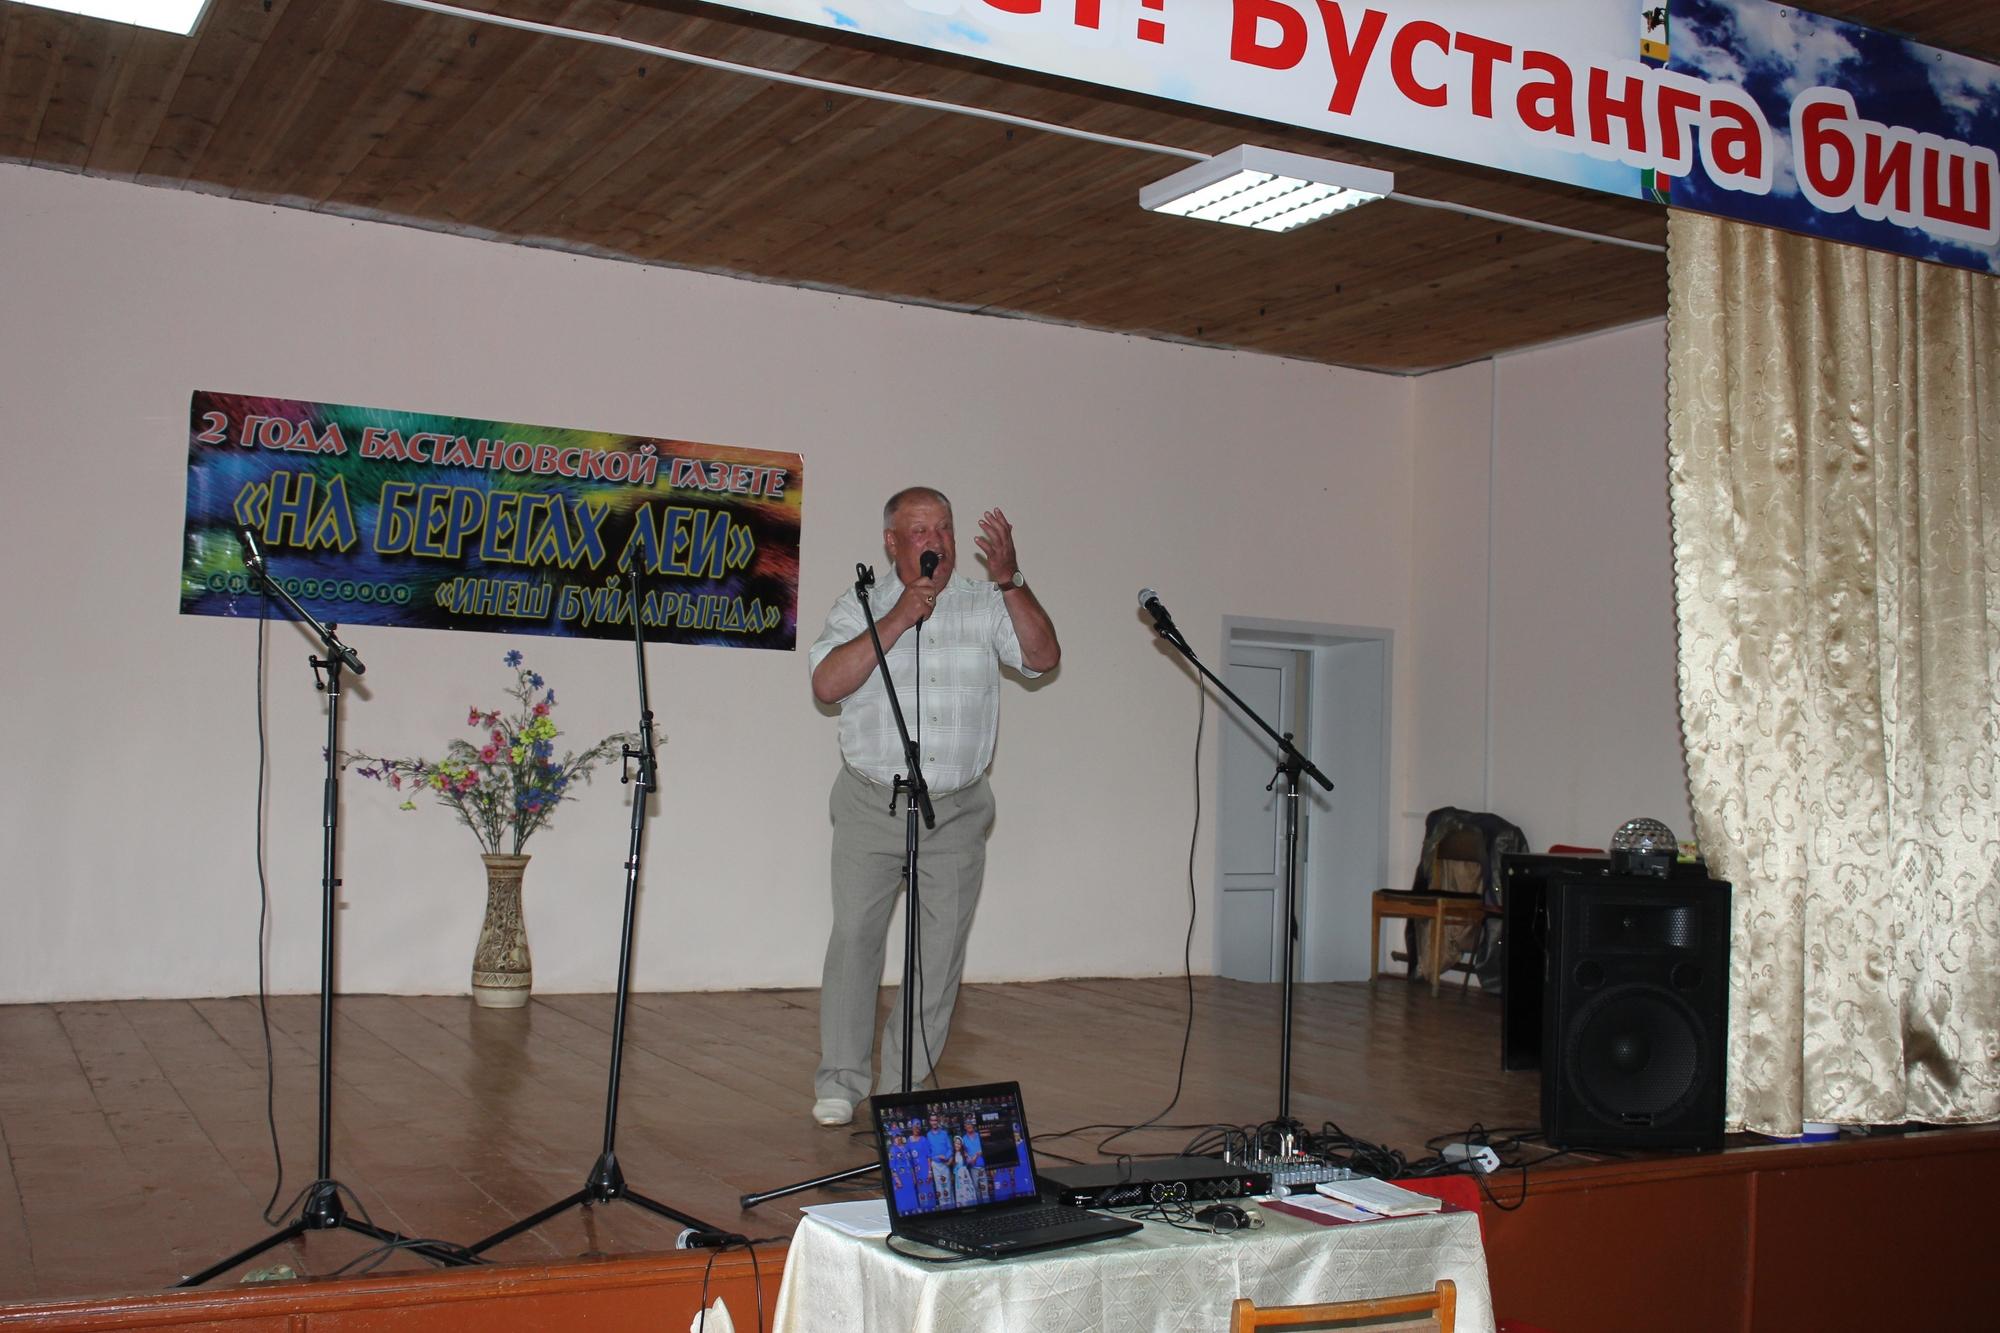 7335-bastanovo-17082019-gazete-na-beregax-leyi-2-goda